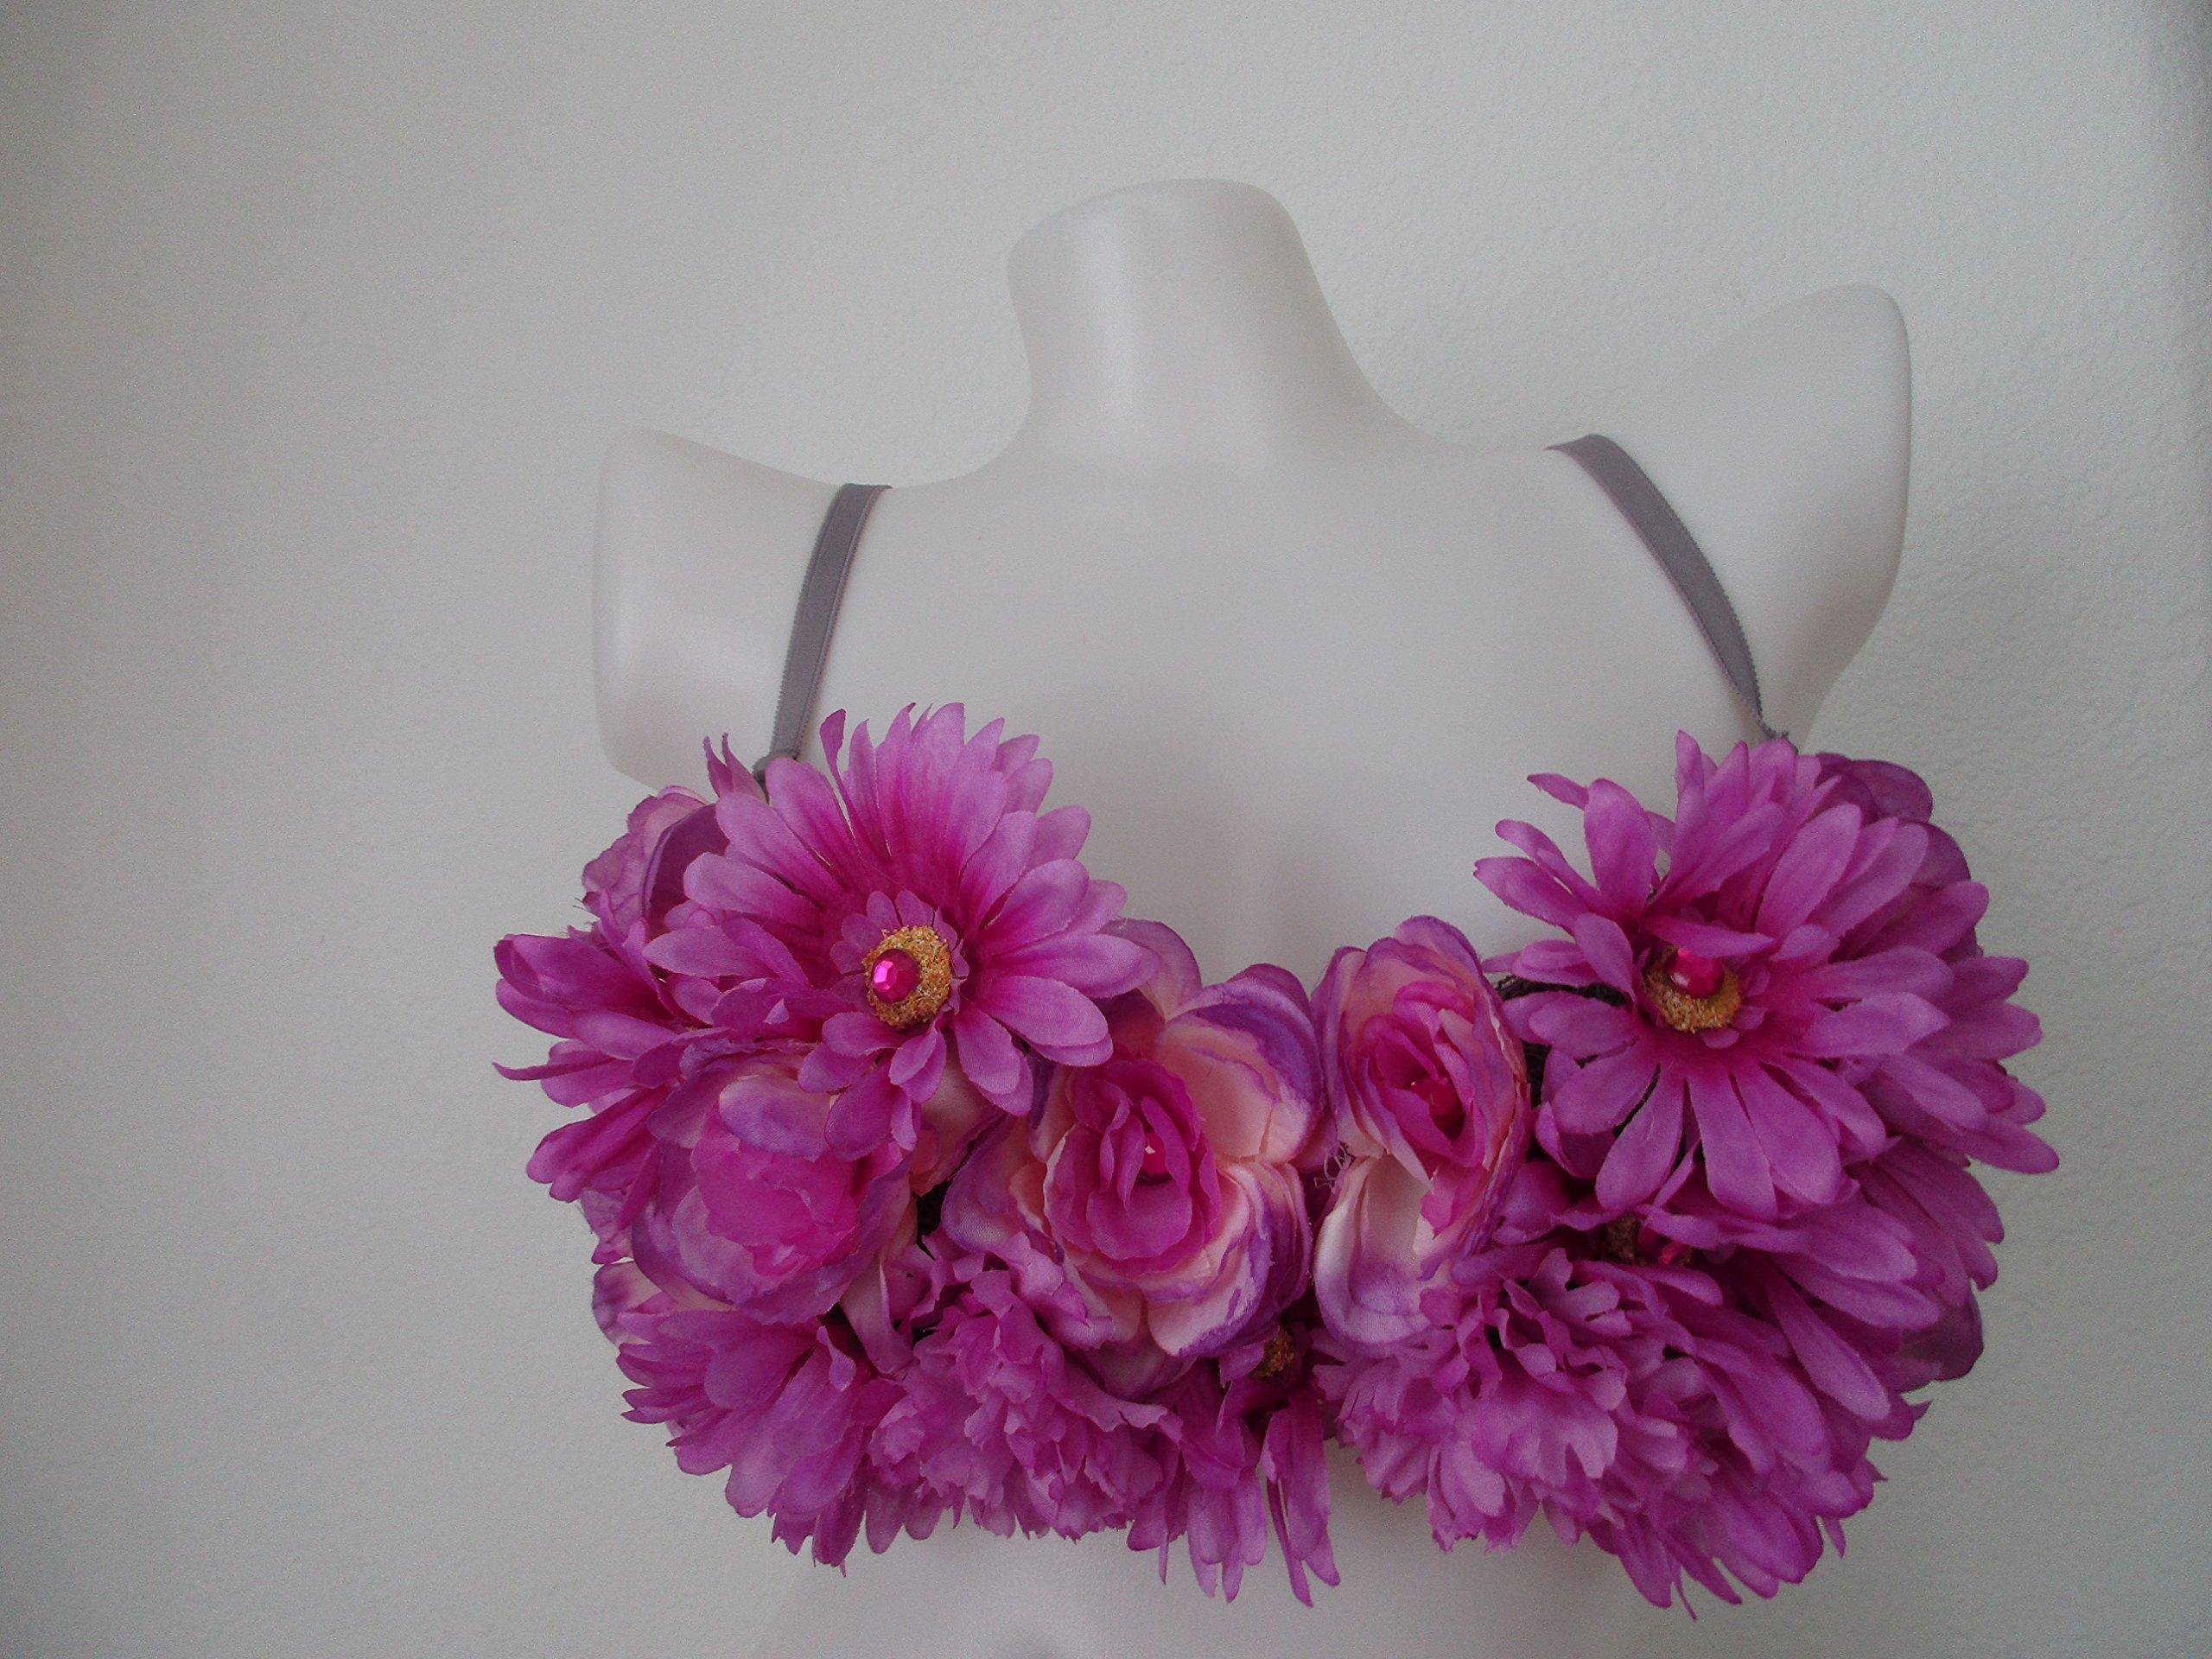 Pink Purple Gray Rave Bra 34B - Floral Embellishment - Nice for EDC / Coachella by Libratique Marketplace LLC